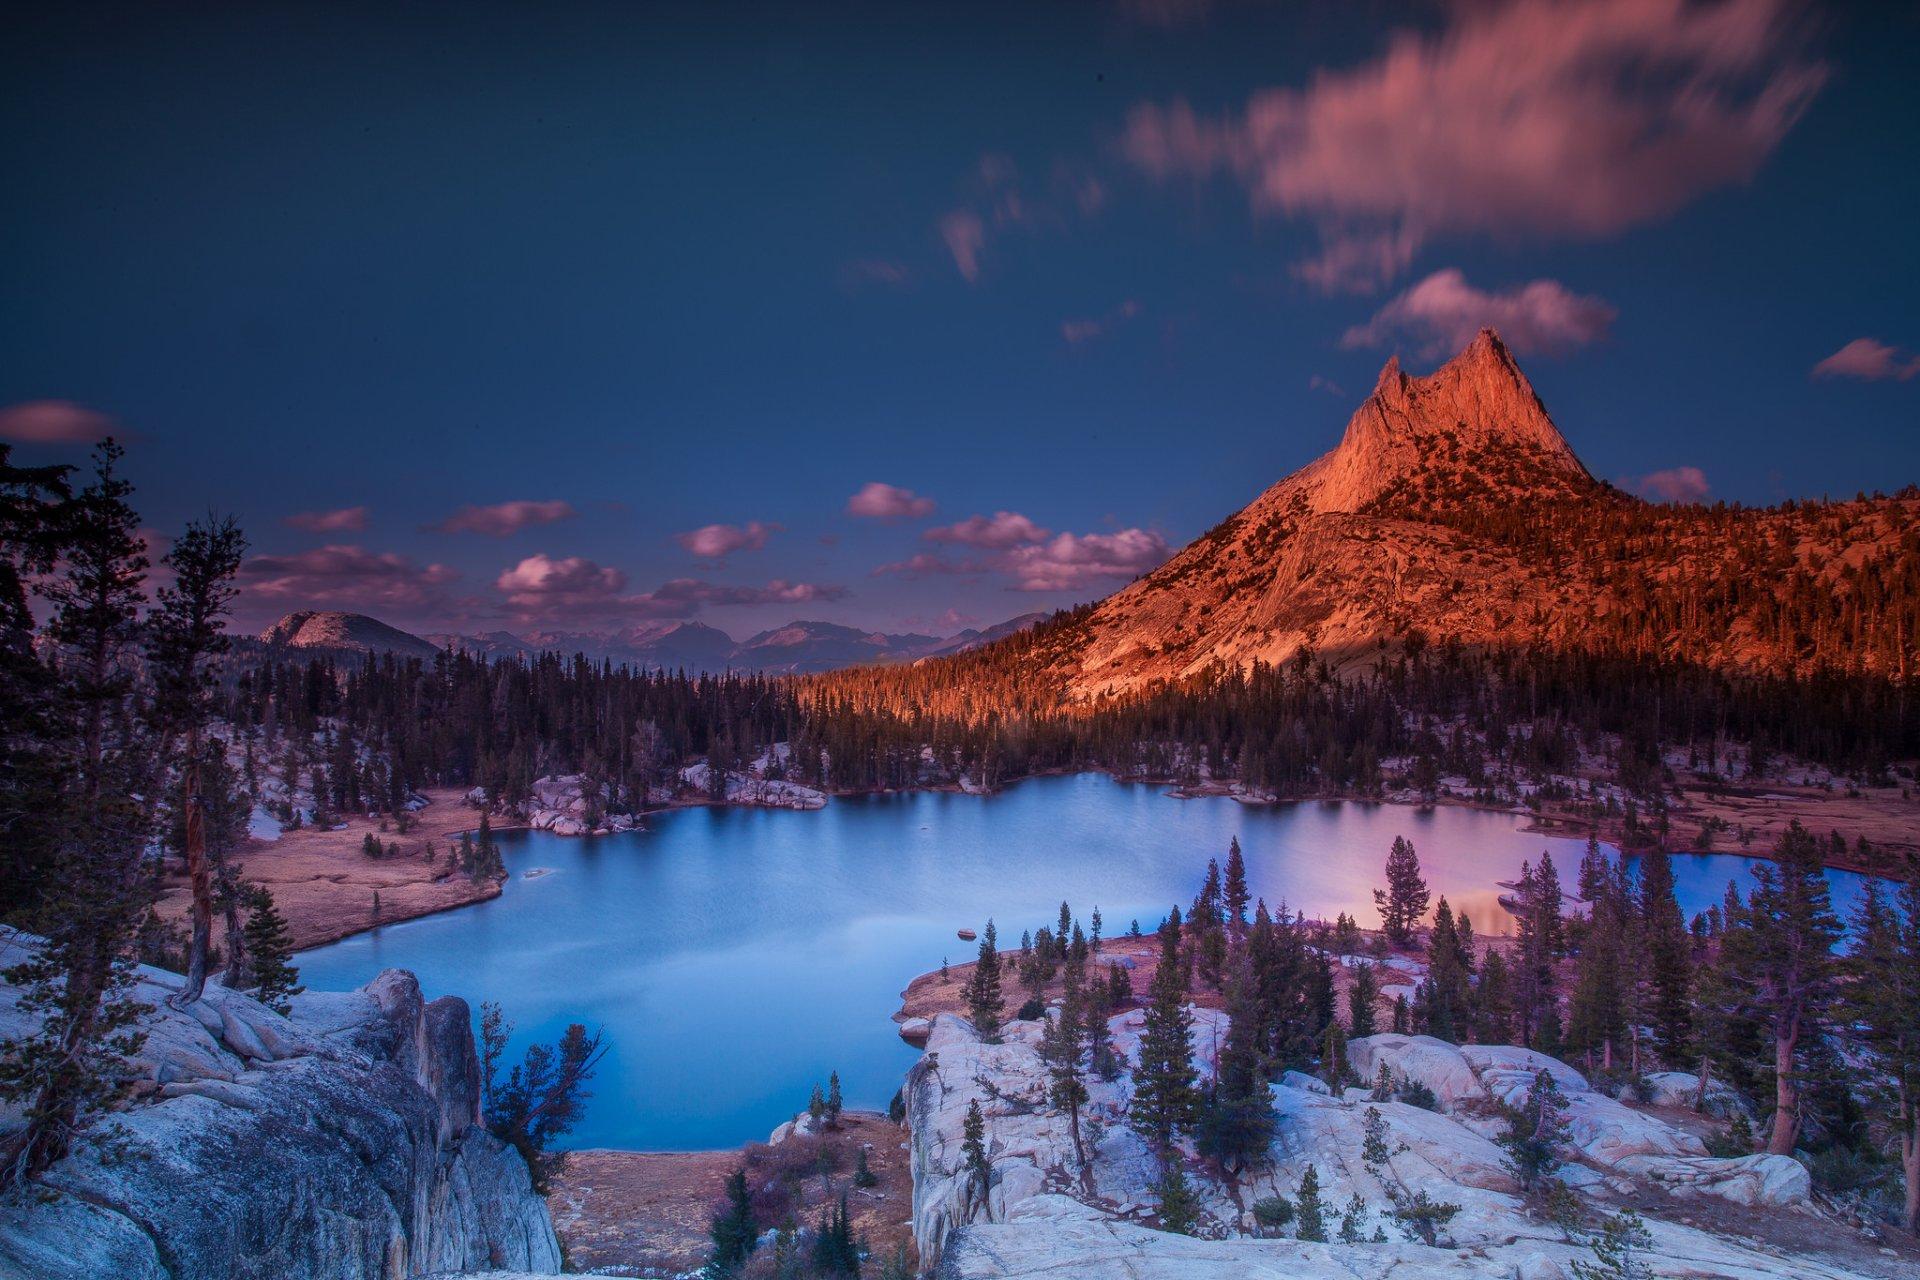 Mountain Landscape Fond d'écran HD | Arrière-Plan | 2048x1365 | ID:760935 - Wallpaper Abyss